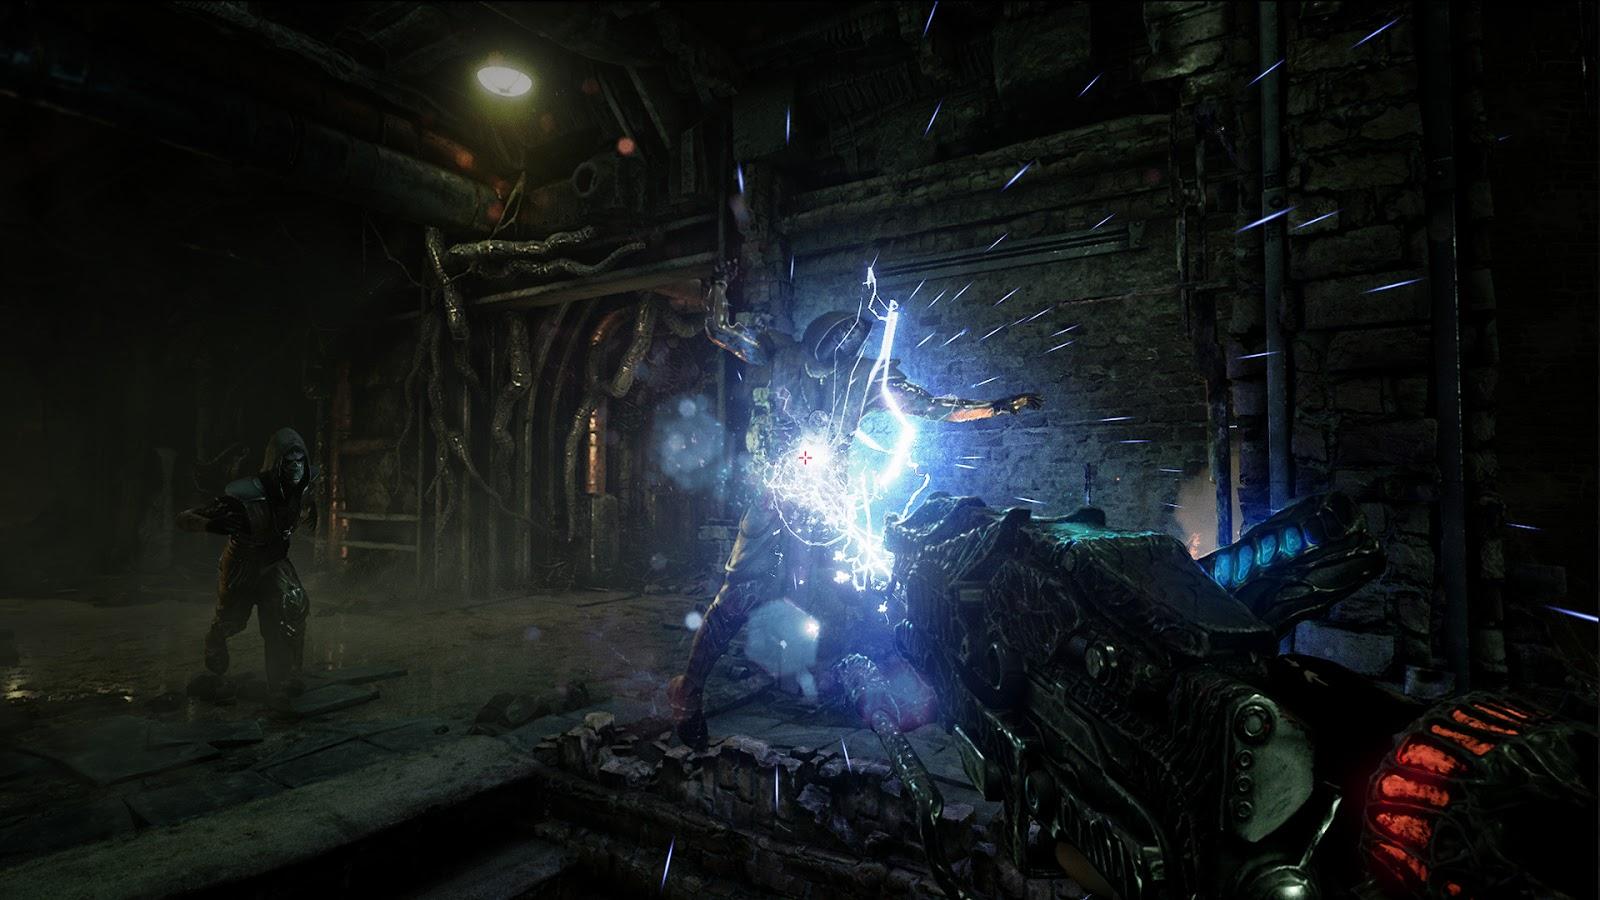 Inner Chains, SciFi, Fantasy, Horror, FPS, Indie Game, Review, фантастика, фэнтези, ужасы, хоррор, шутер, рецензия, обзор, инди